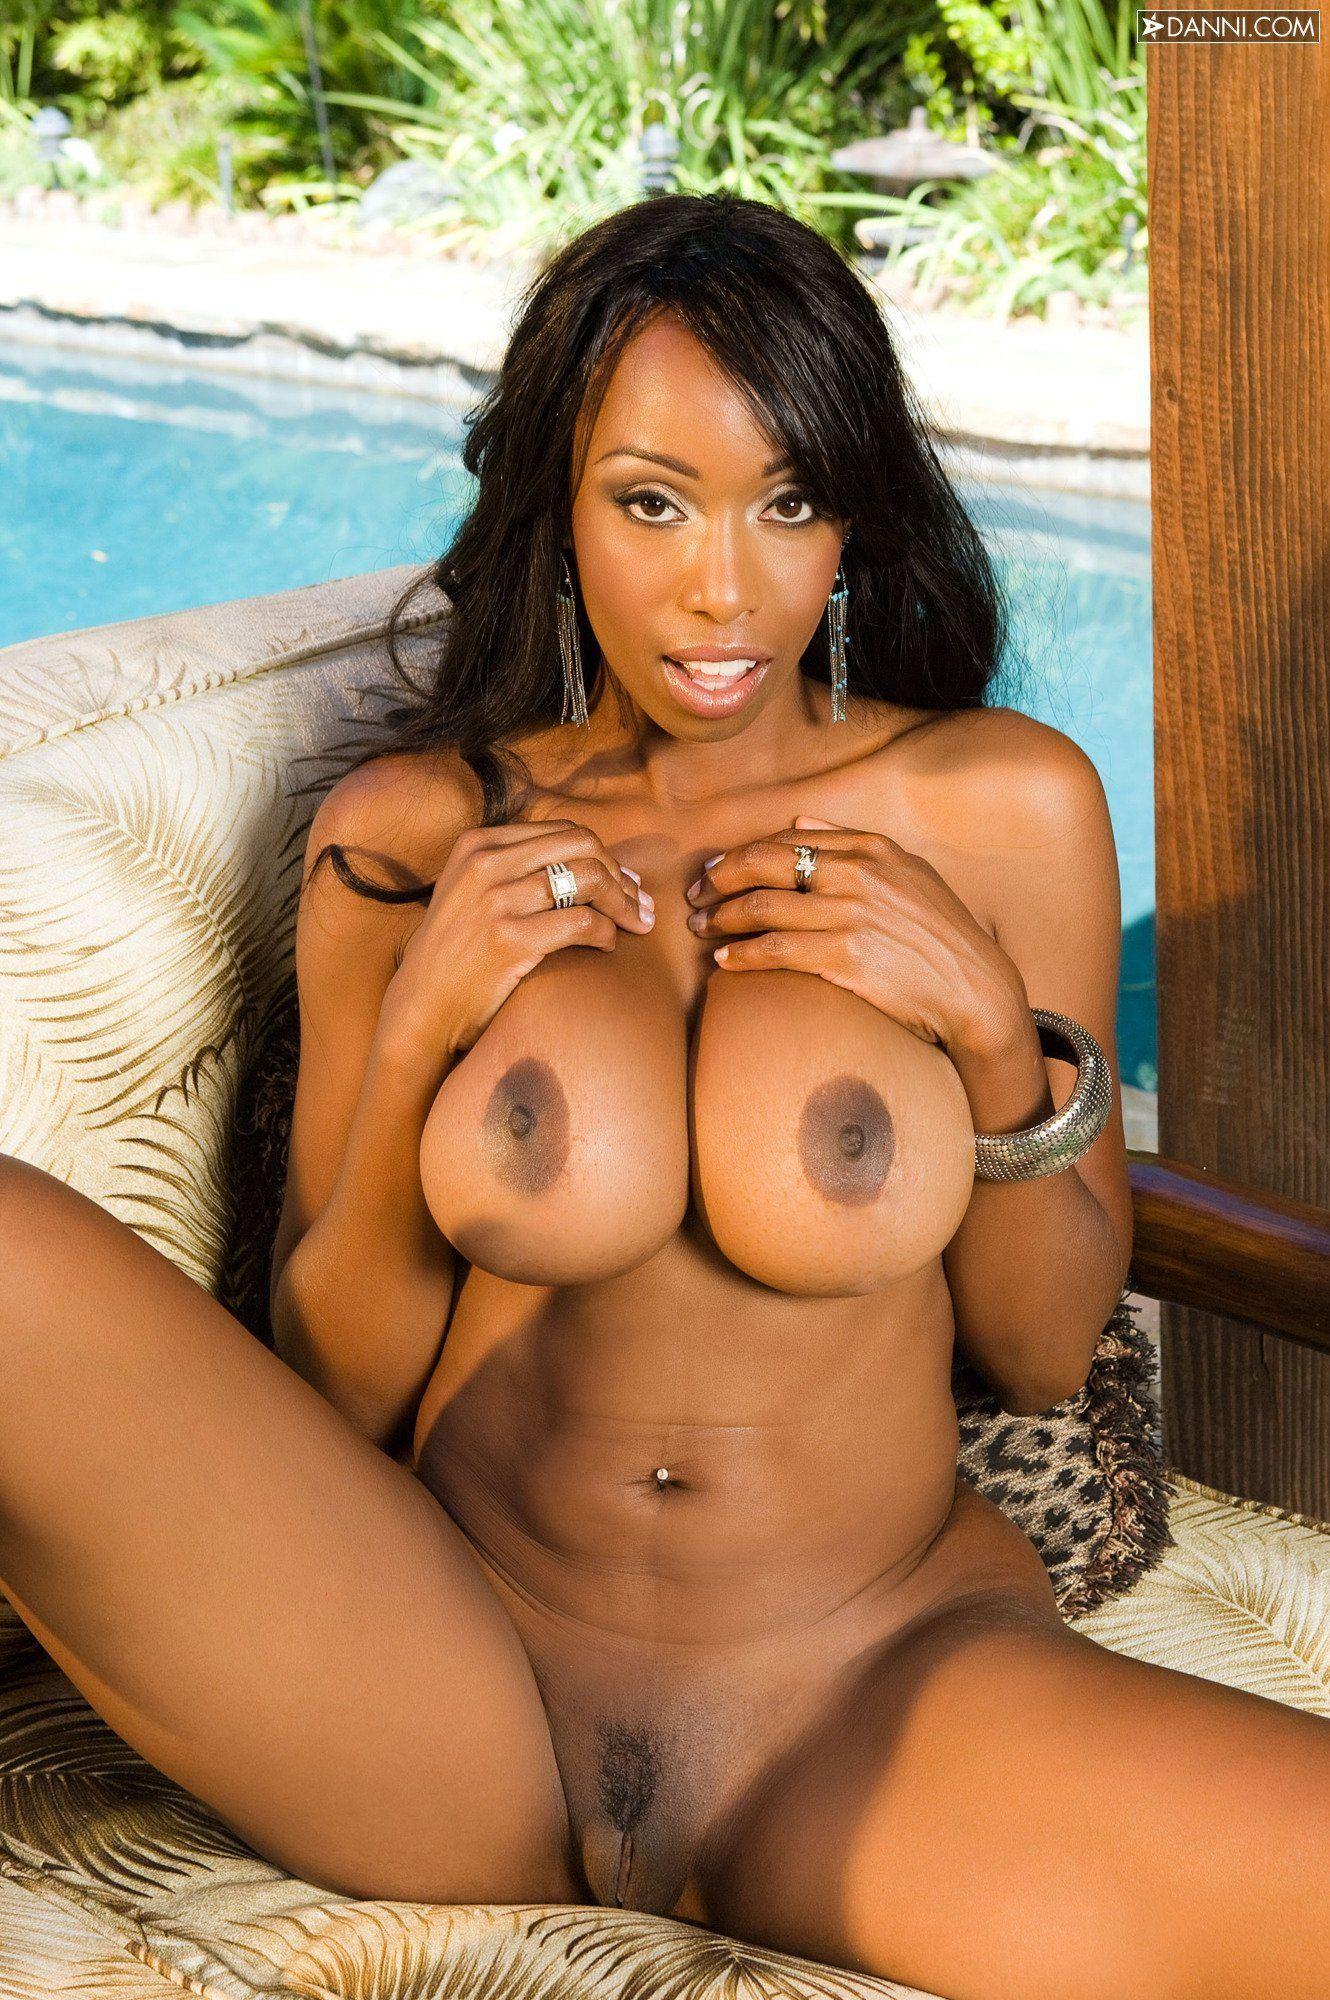 Black women nude images